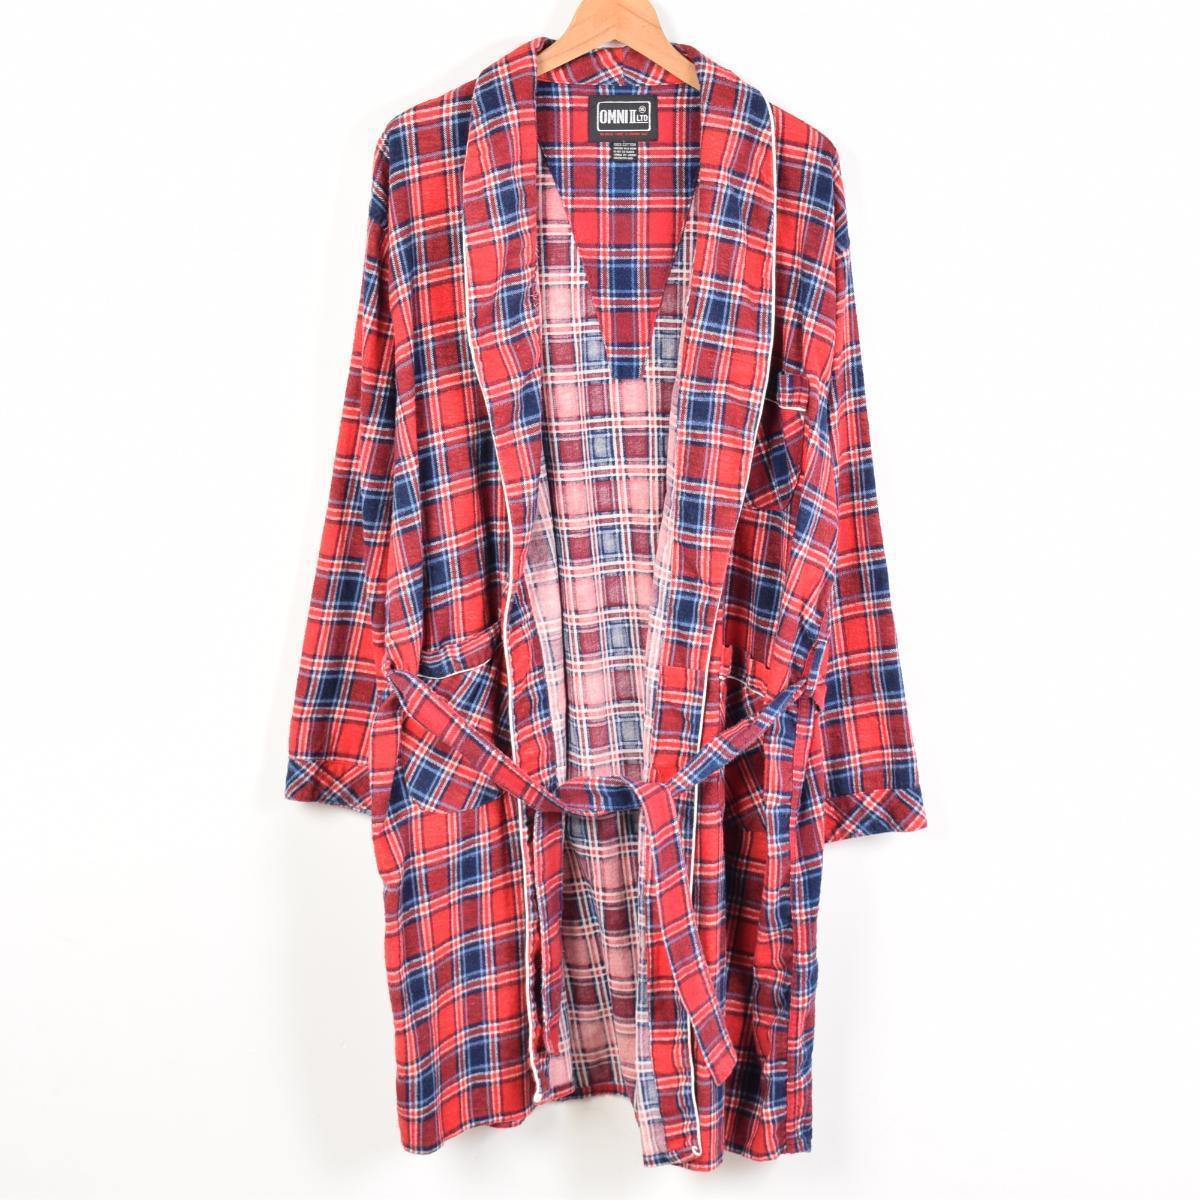 VINTAGE CLOTHING JAM | Rakuten Global Market: OMNI 2 LTD tartan ...